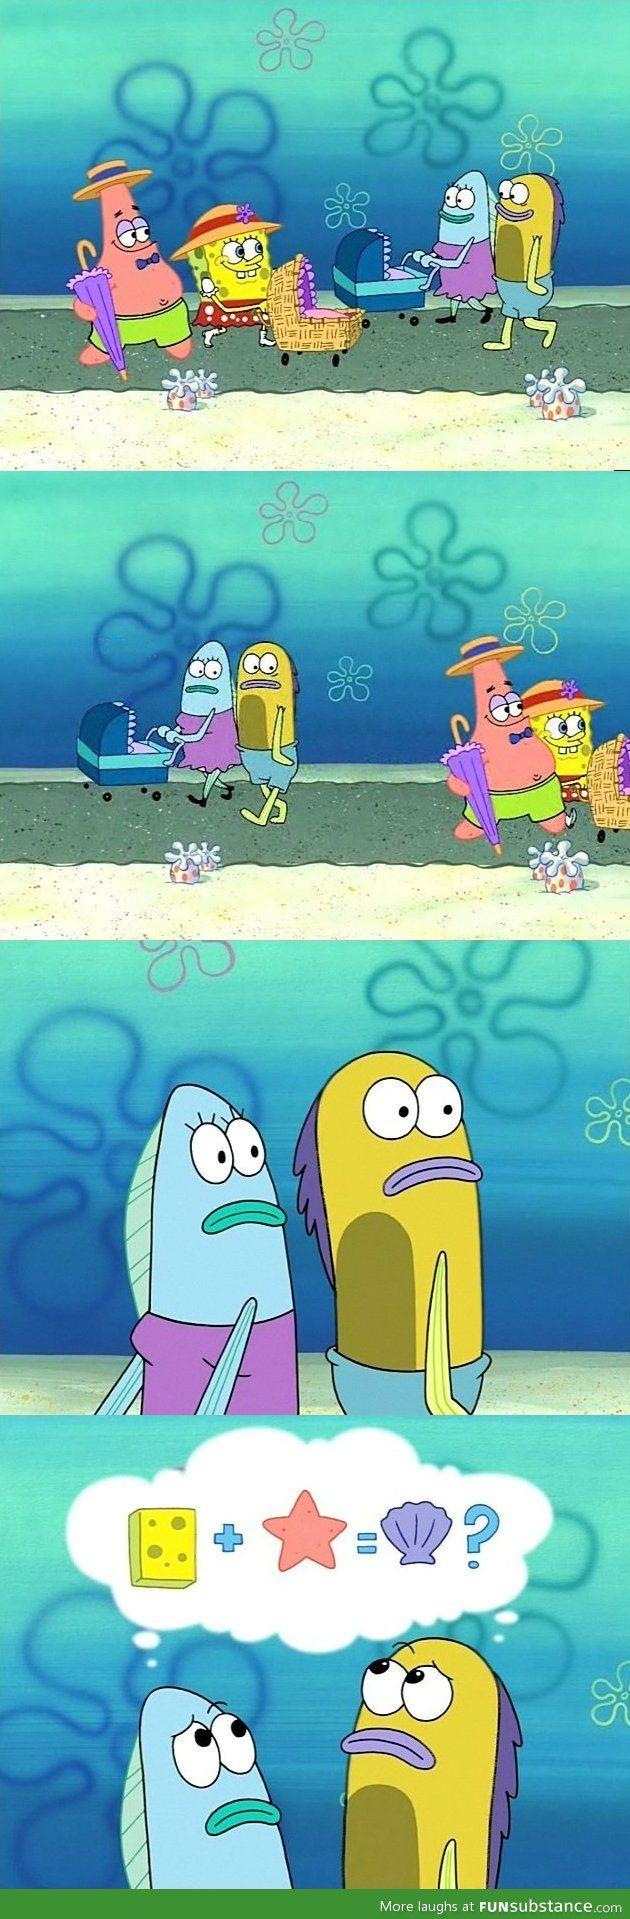 pics funny gay Funny Gay Patrick Spongebob Gay spongebob Funny